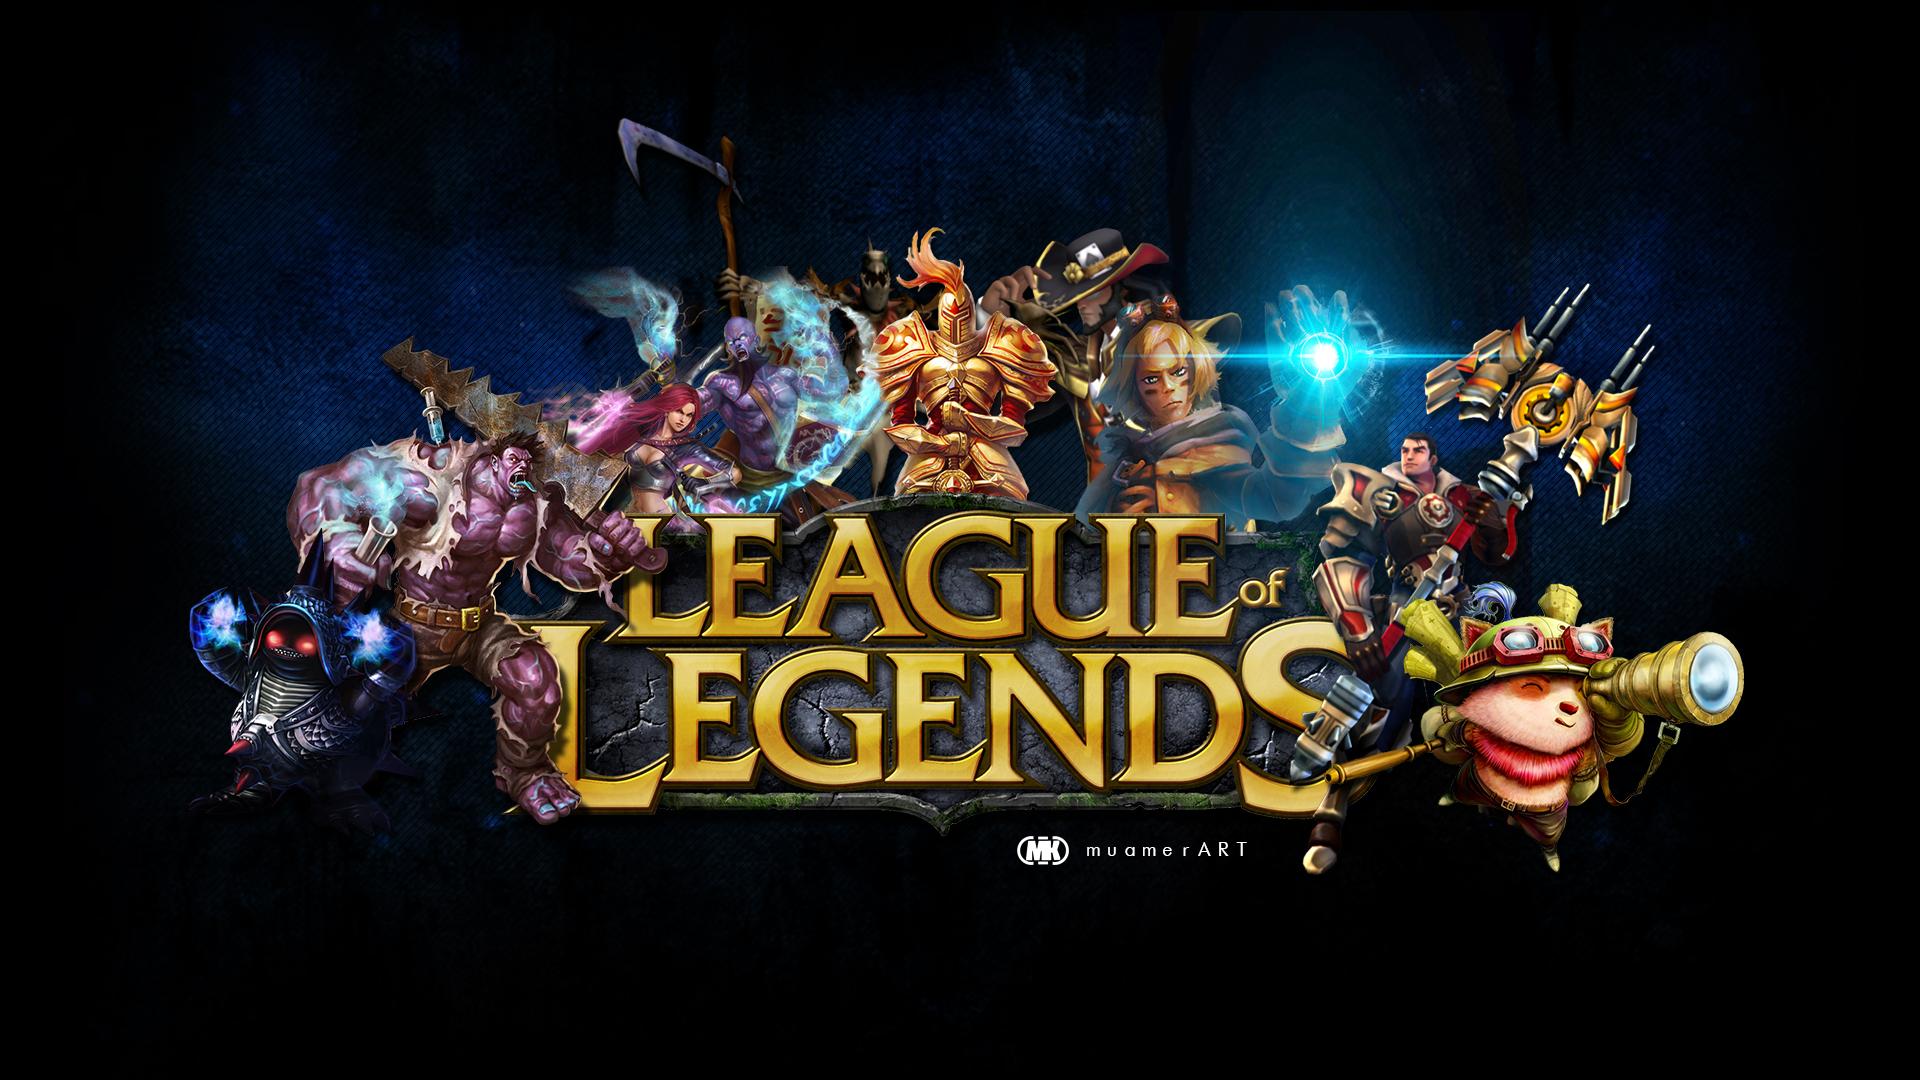 League Of Legends Wallpapers Hd wallpaper   1108495 1920x1080